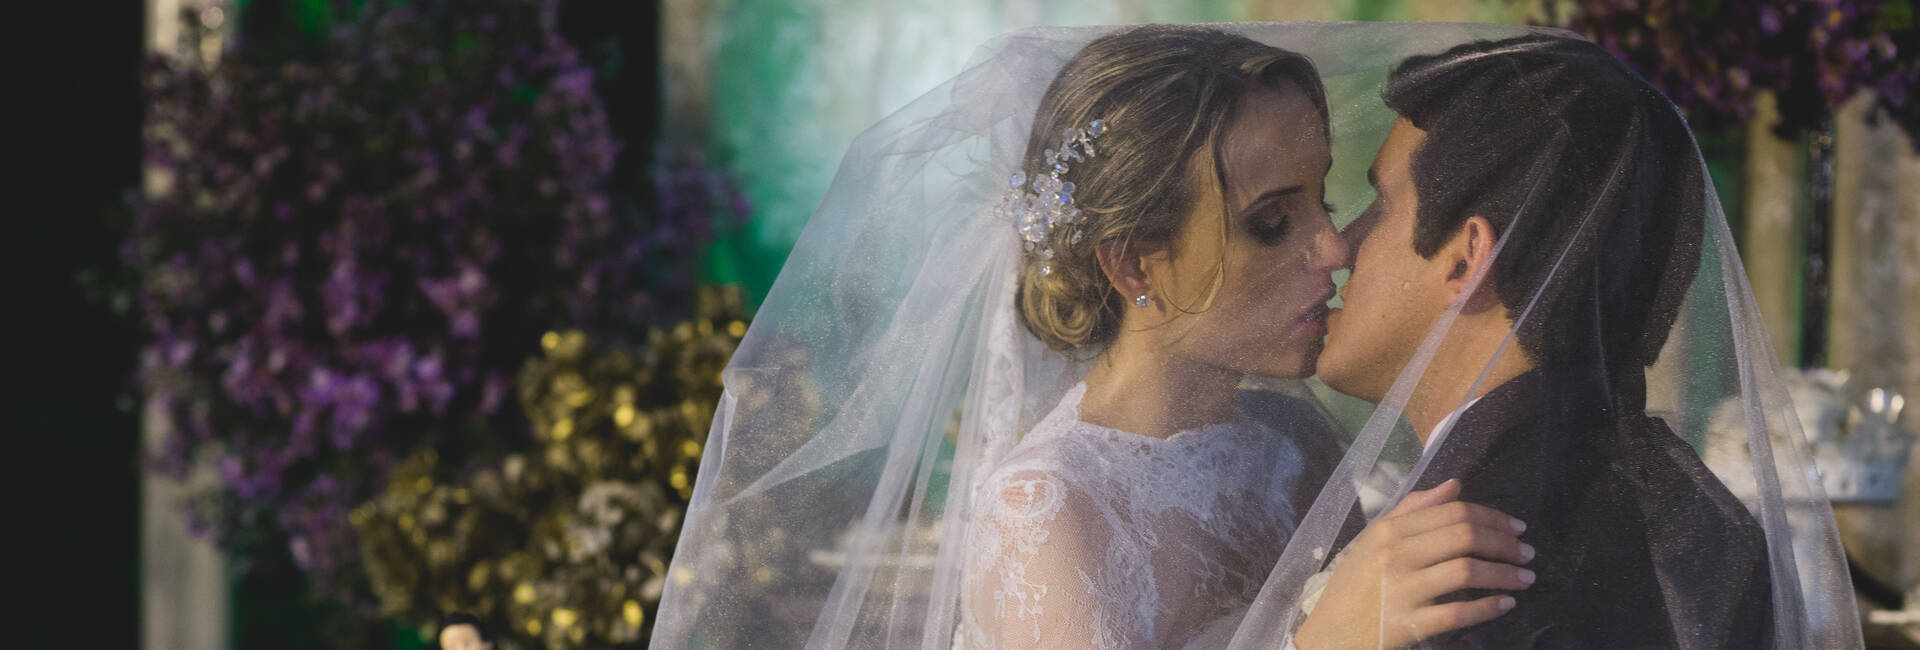 Casamento de Francina & Eduardo